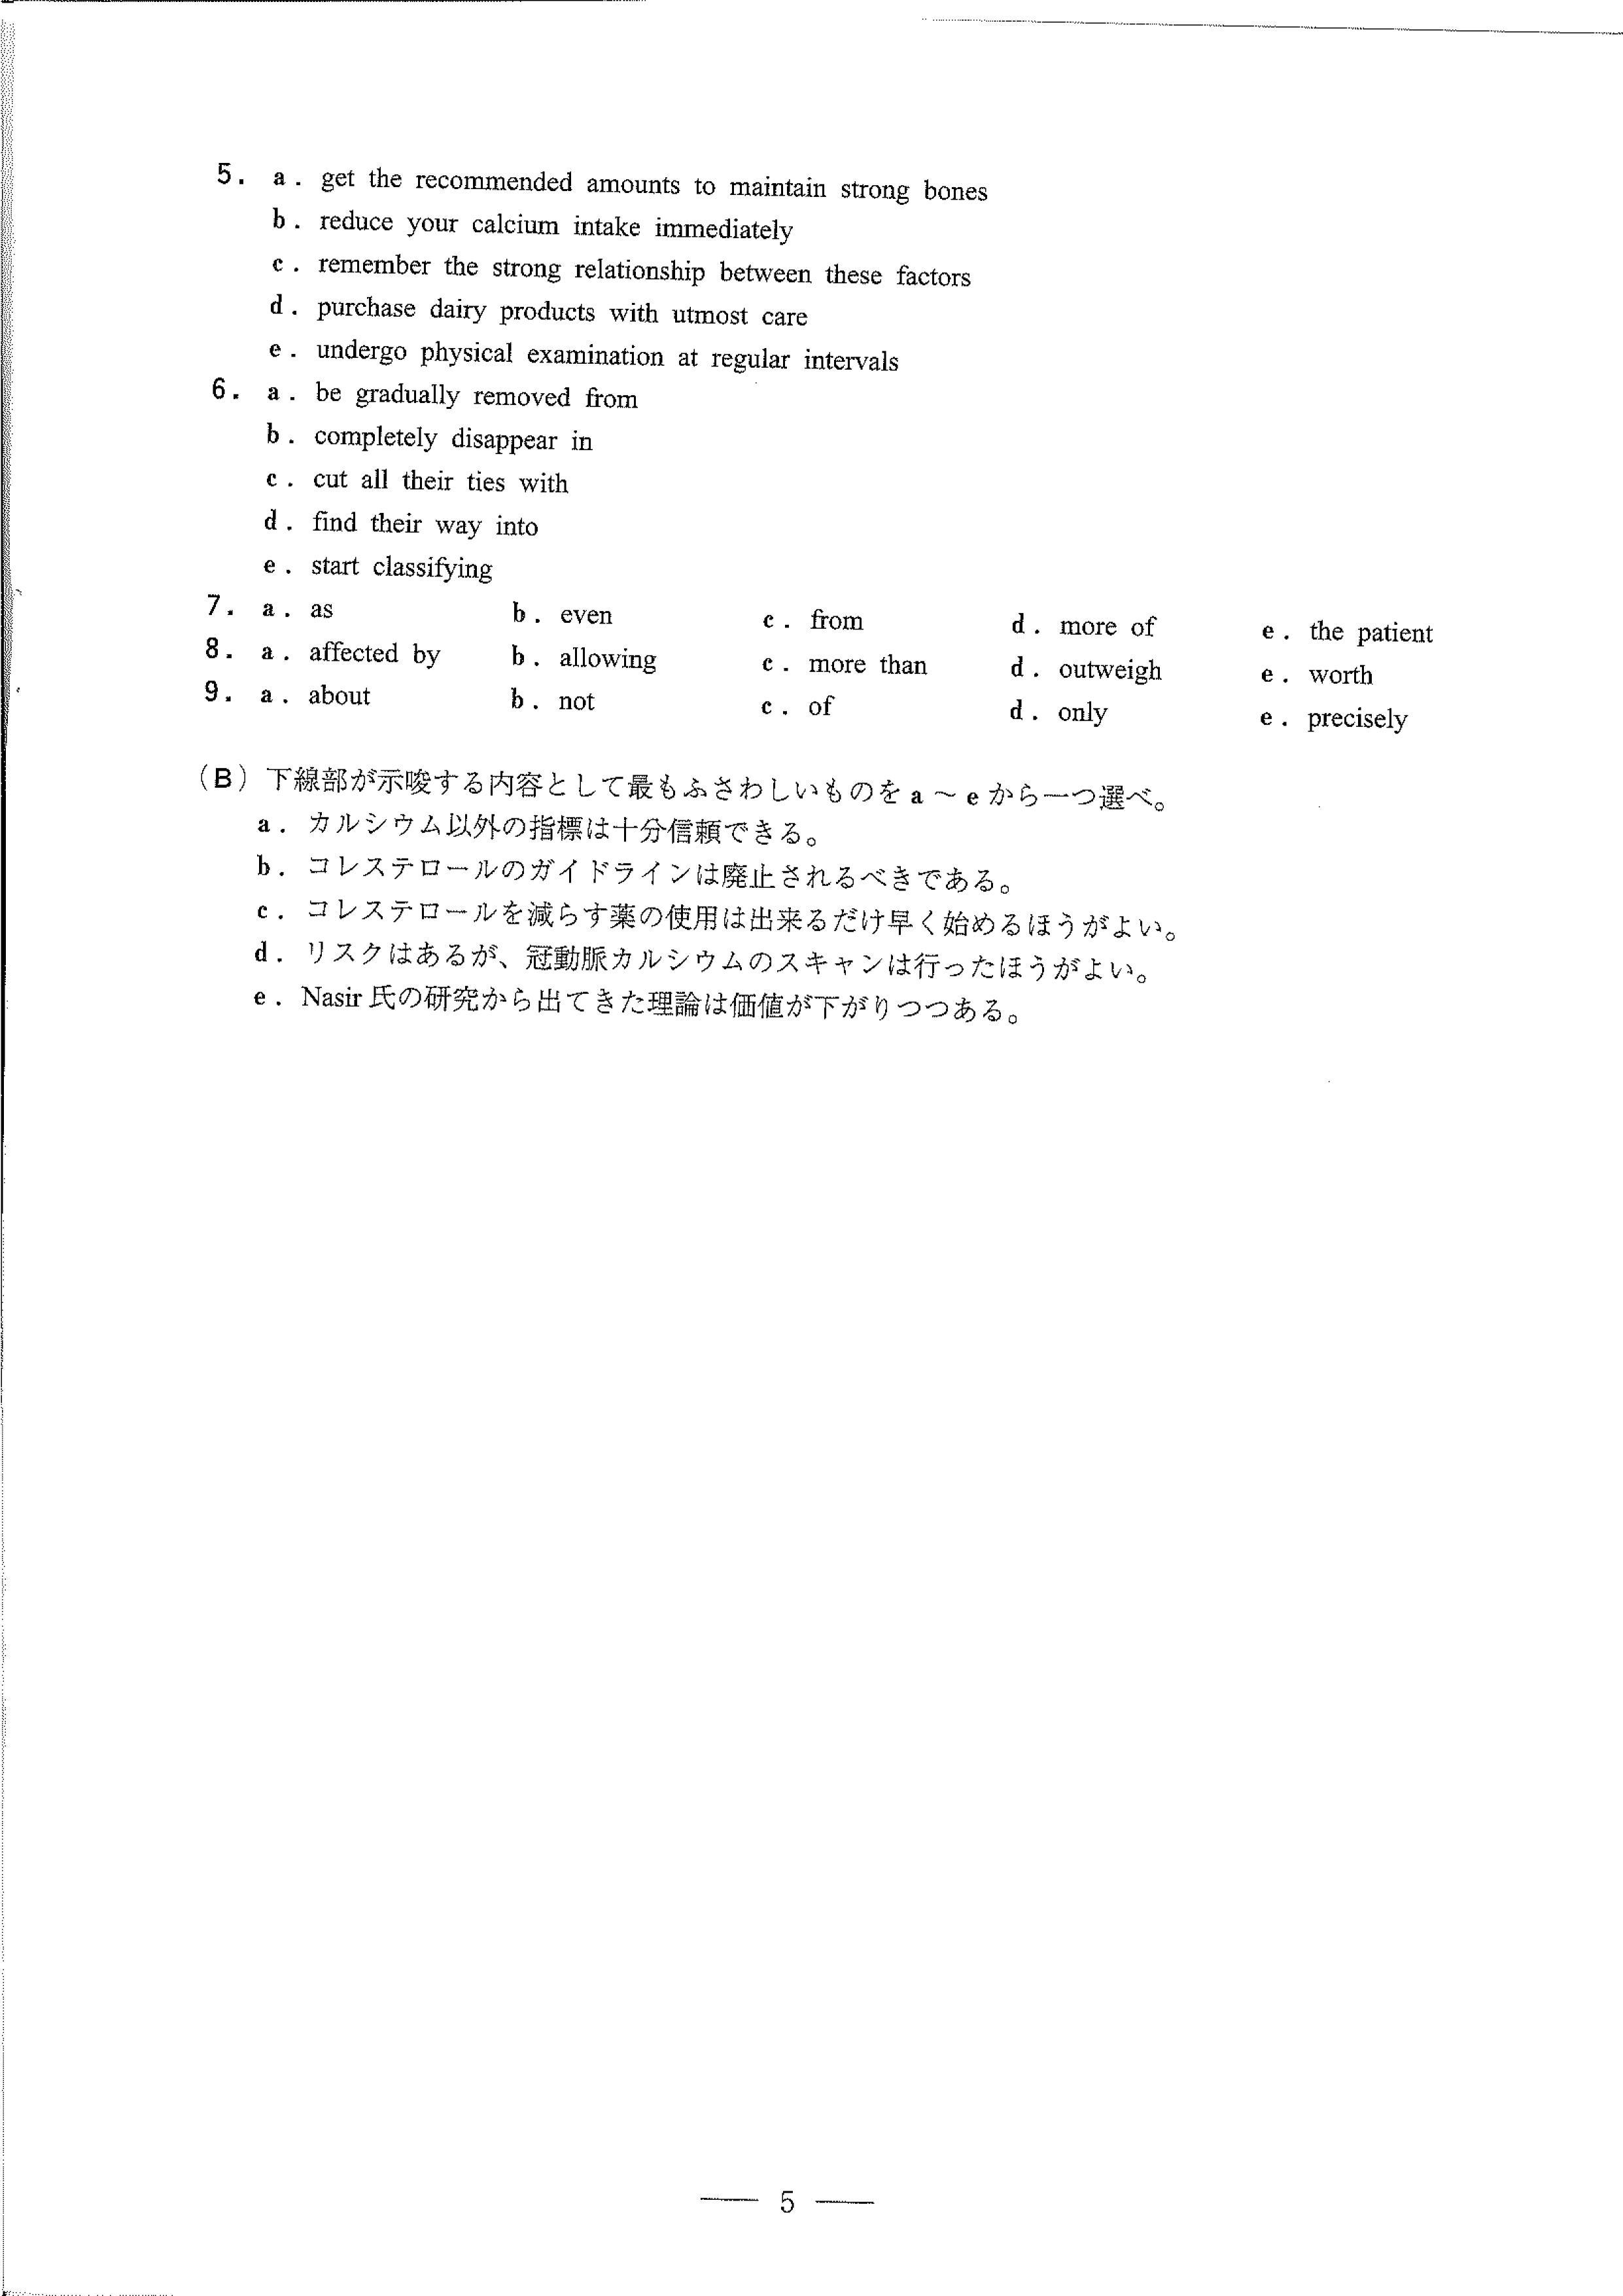 早大教英問 (2015)_02